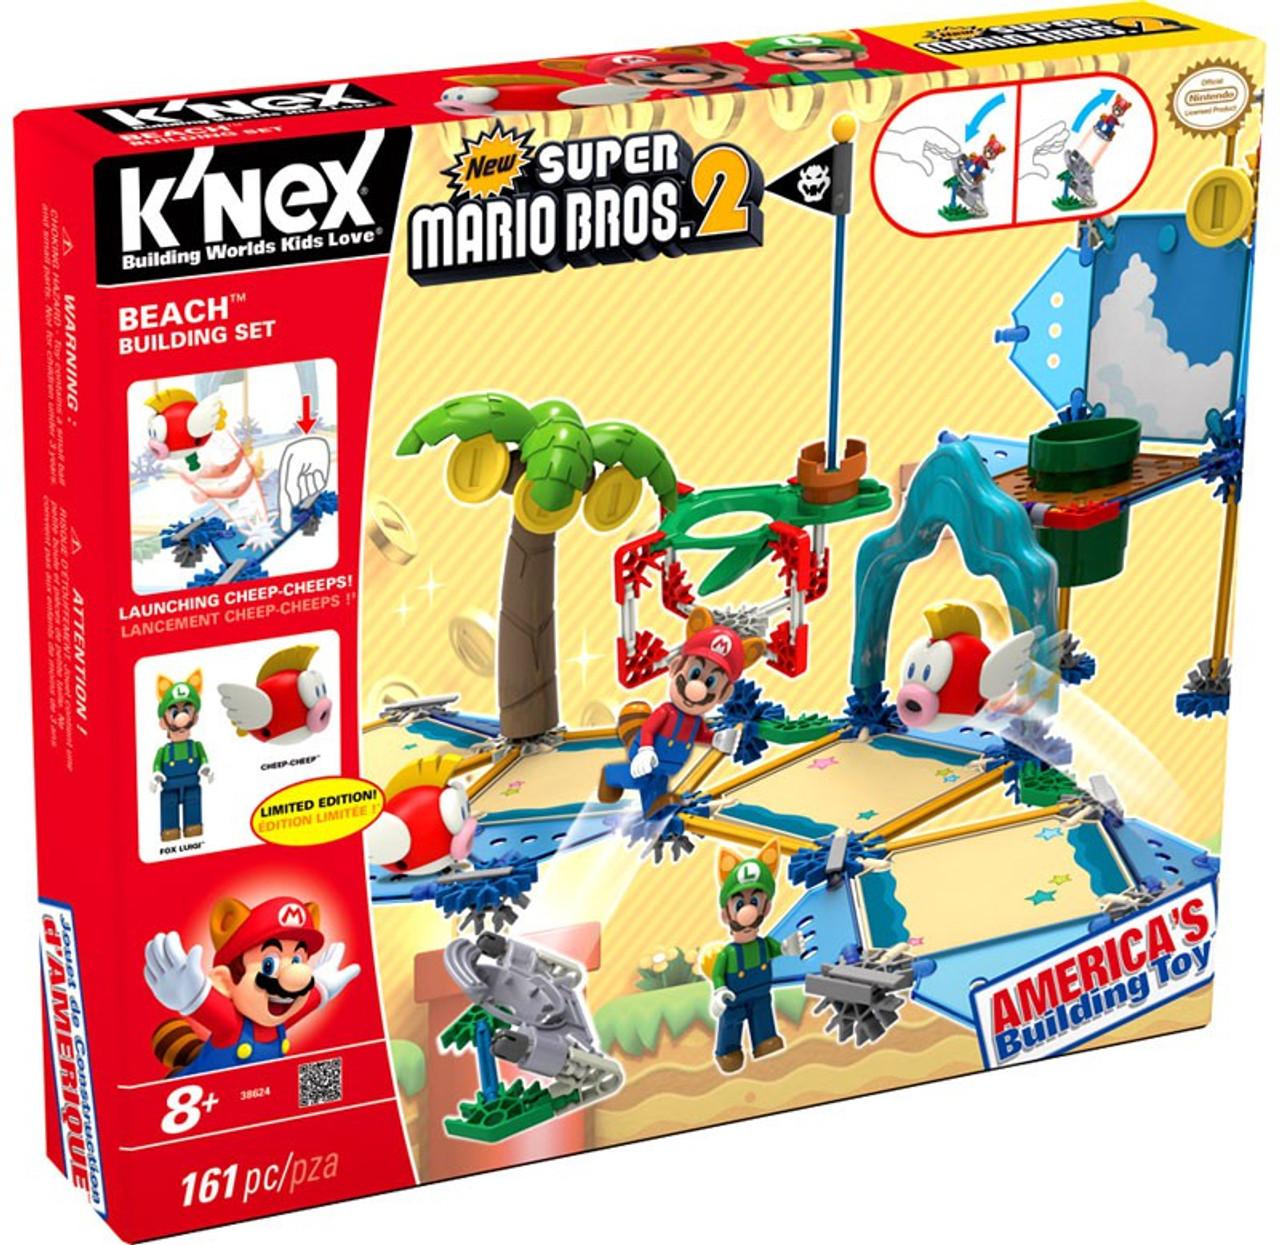 Knex New Super Mario Bros 2 Beach Building Set 38624 Toywiz